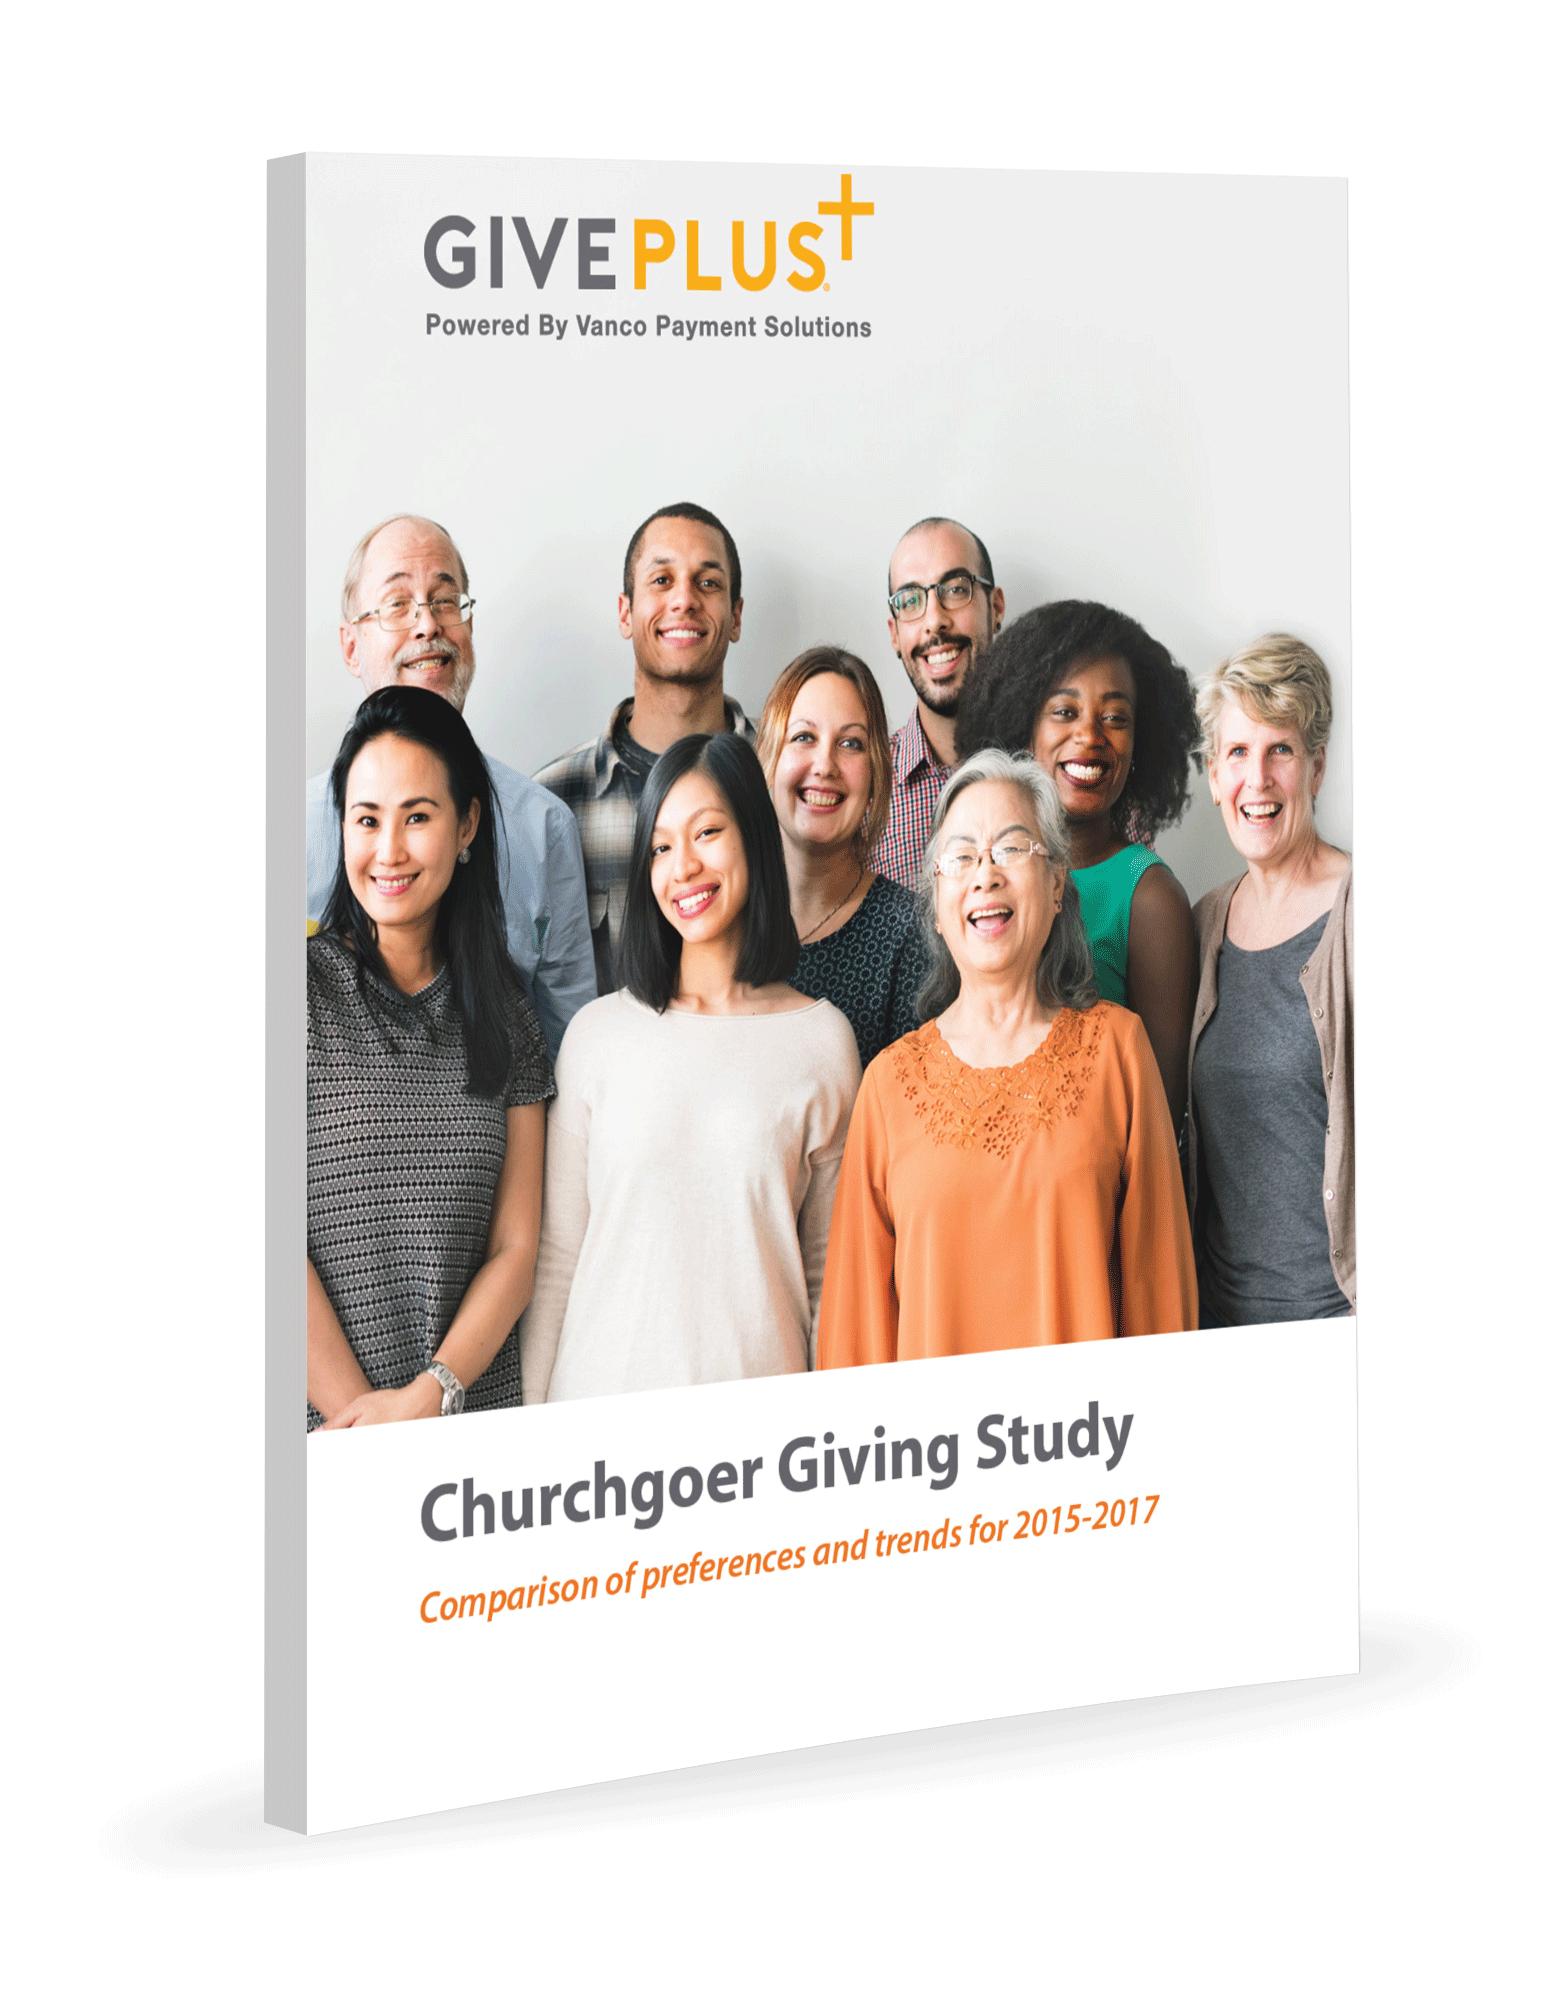 Churchgoer Giving Study Findings Report_2015-2017